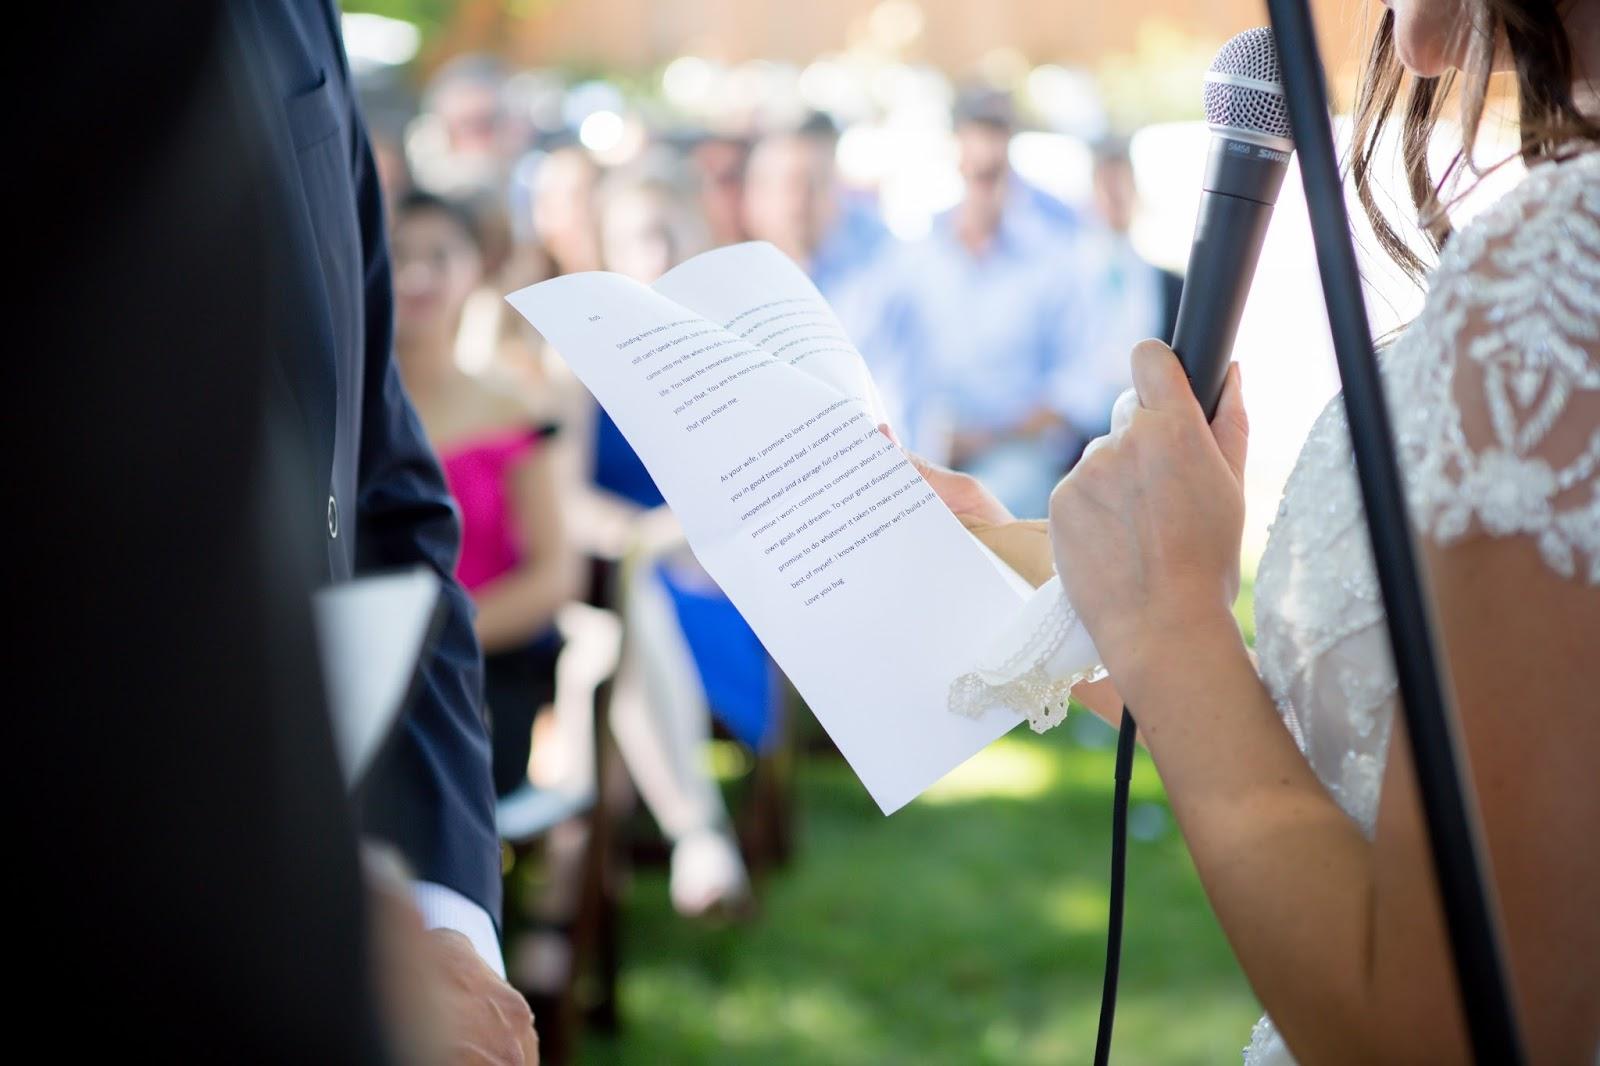 backyard wedding brides vows